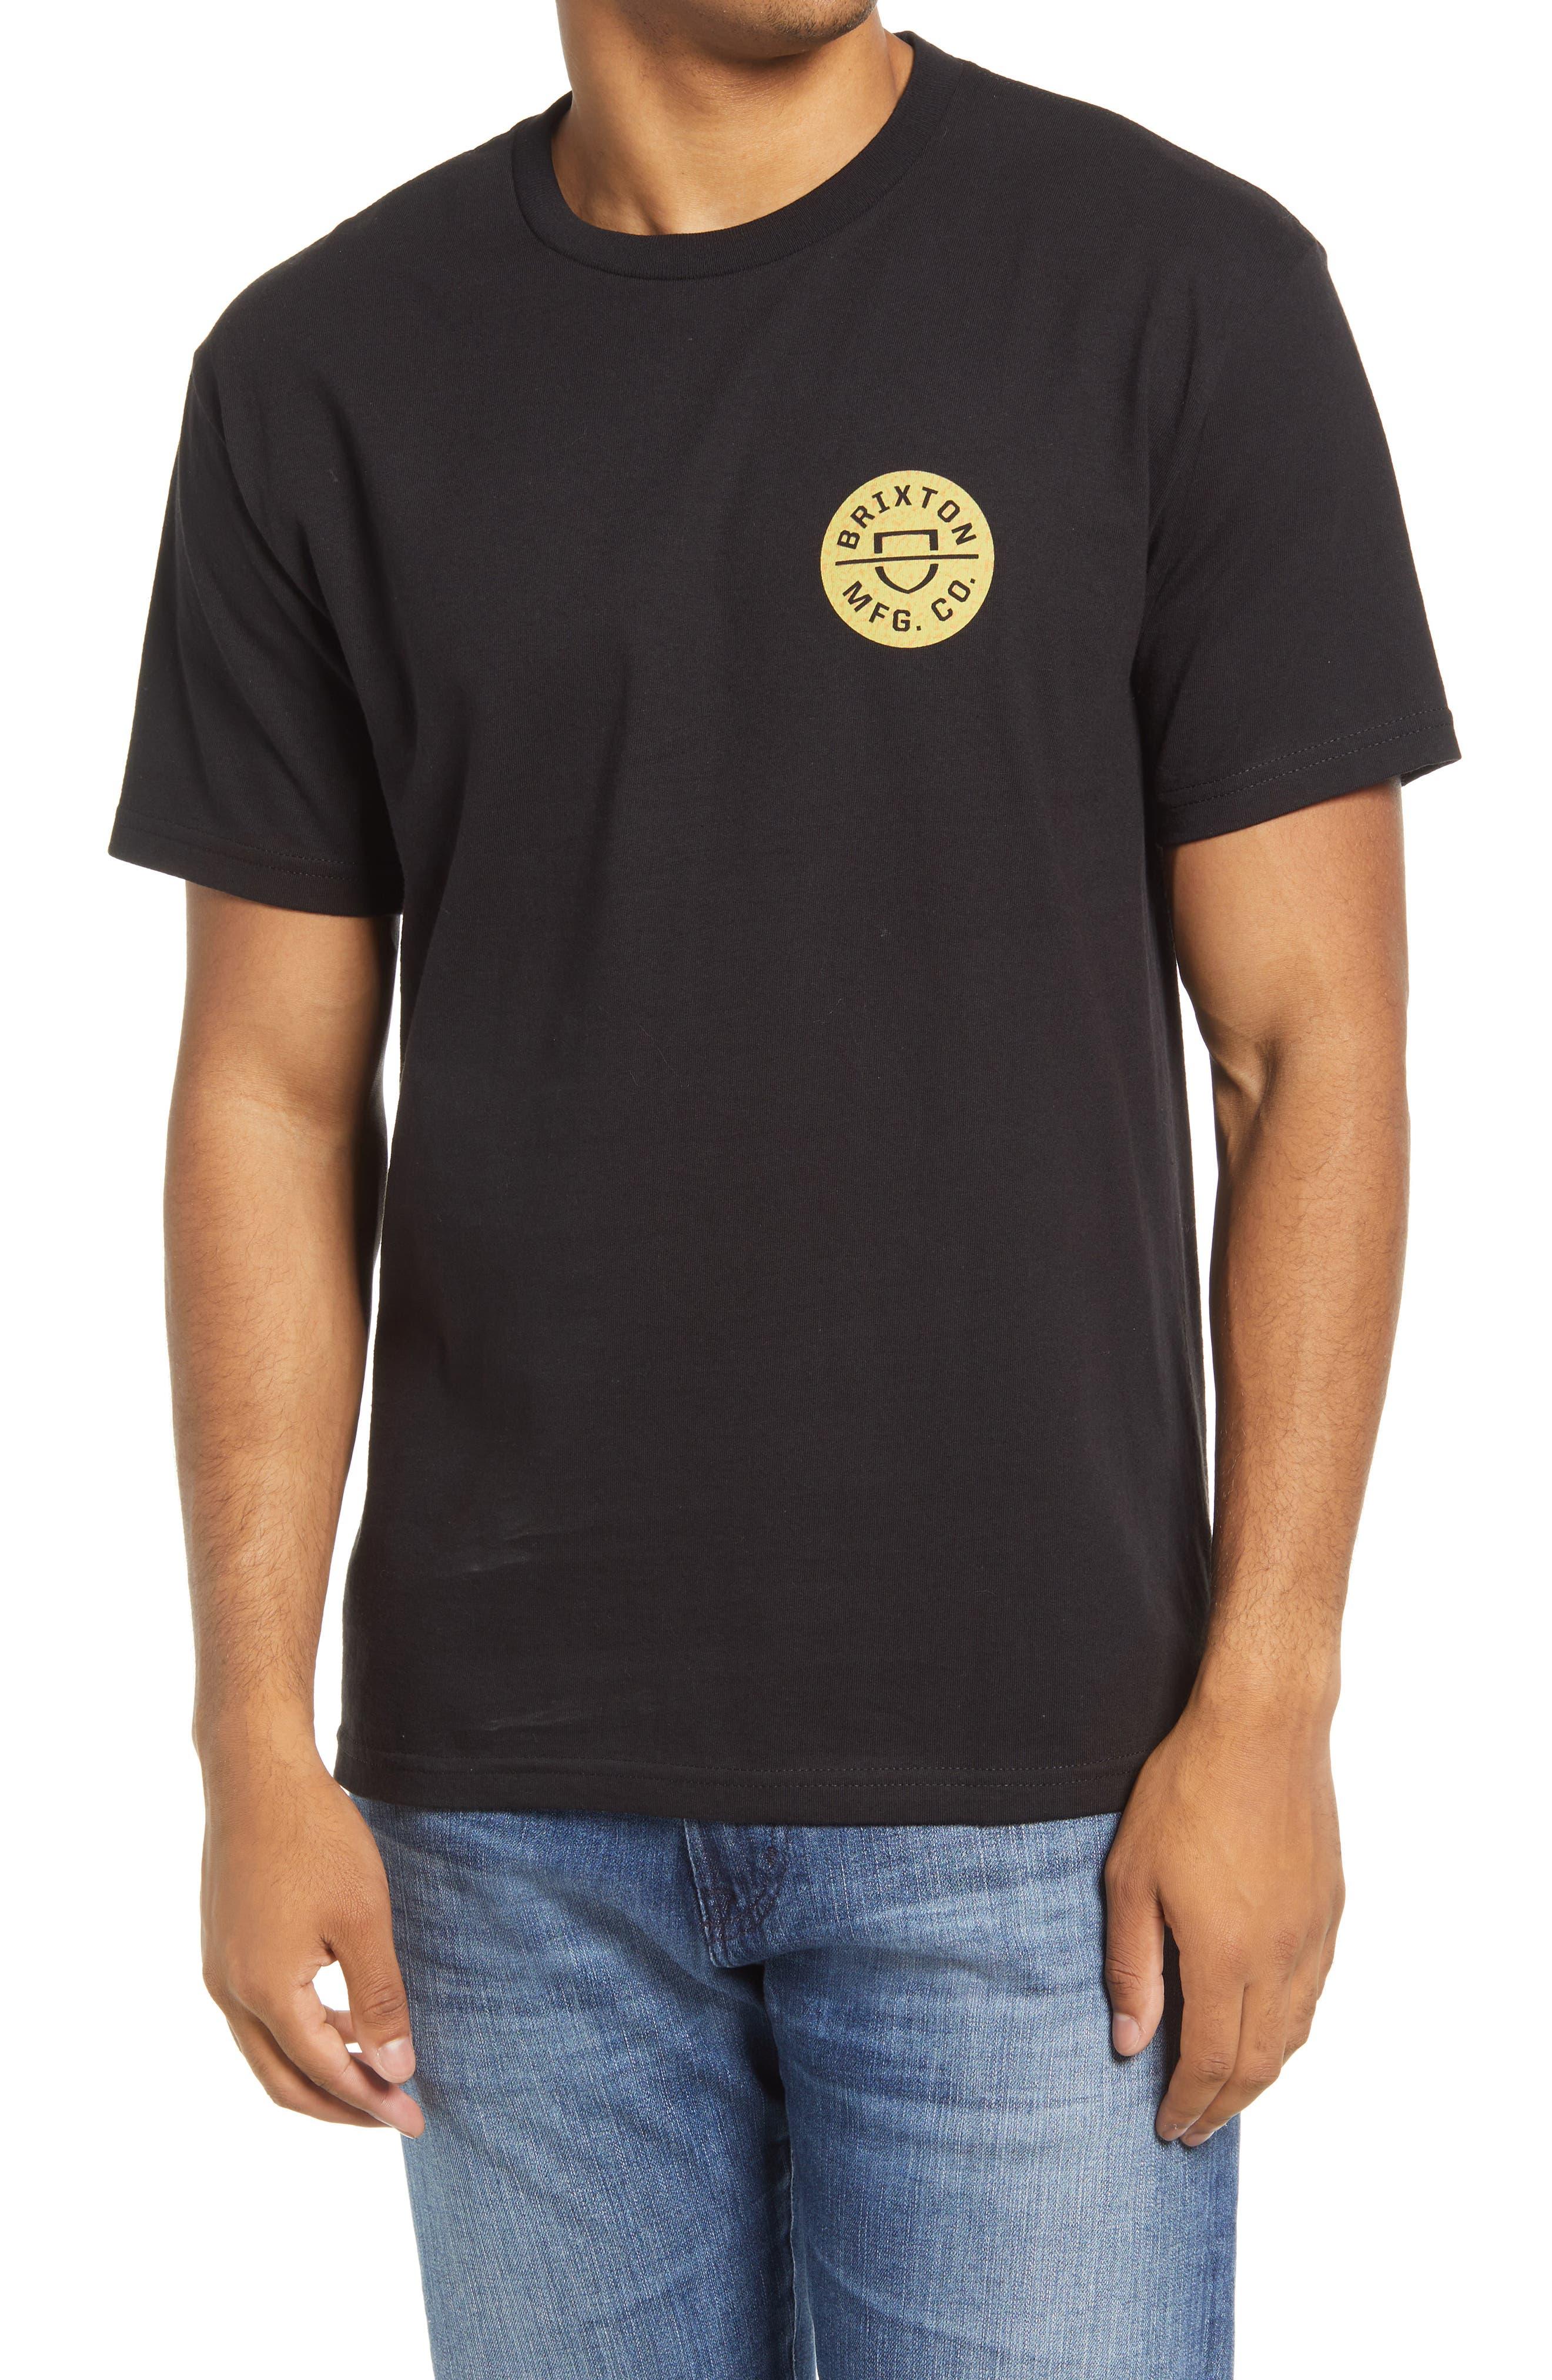 Crest Ii Logo Cotton Graphic Tee